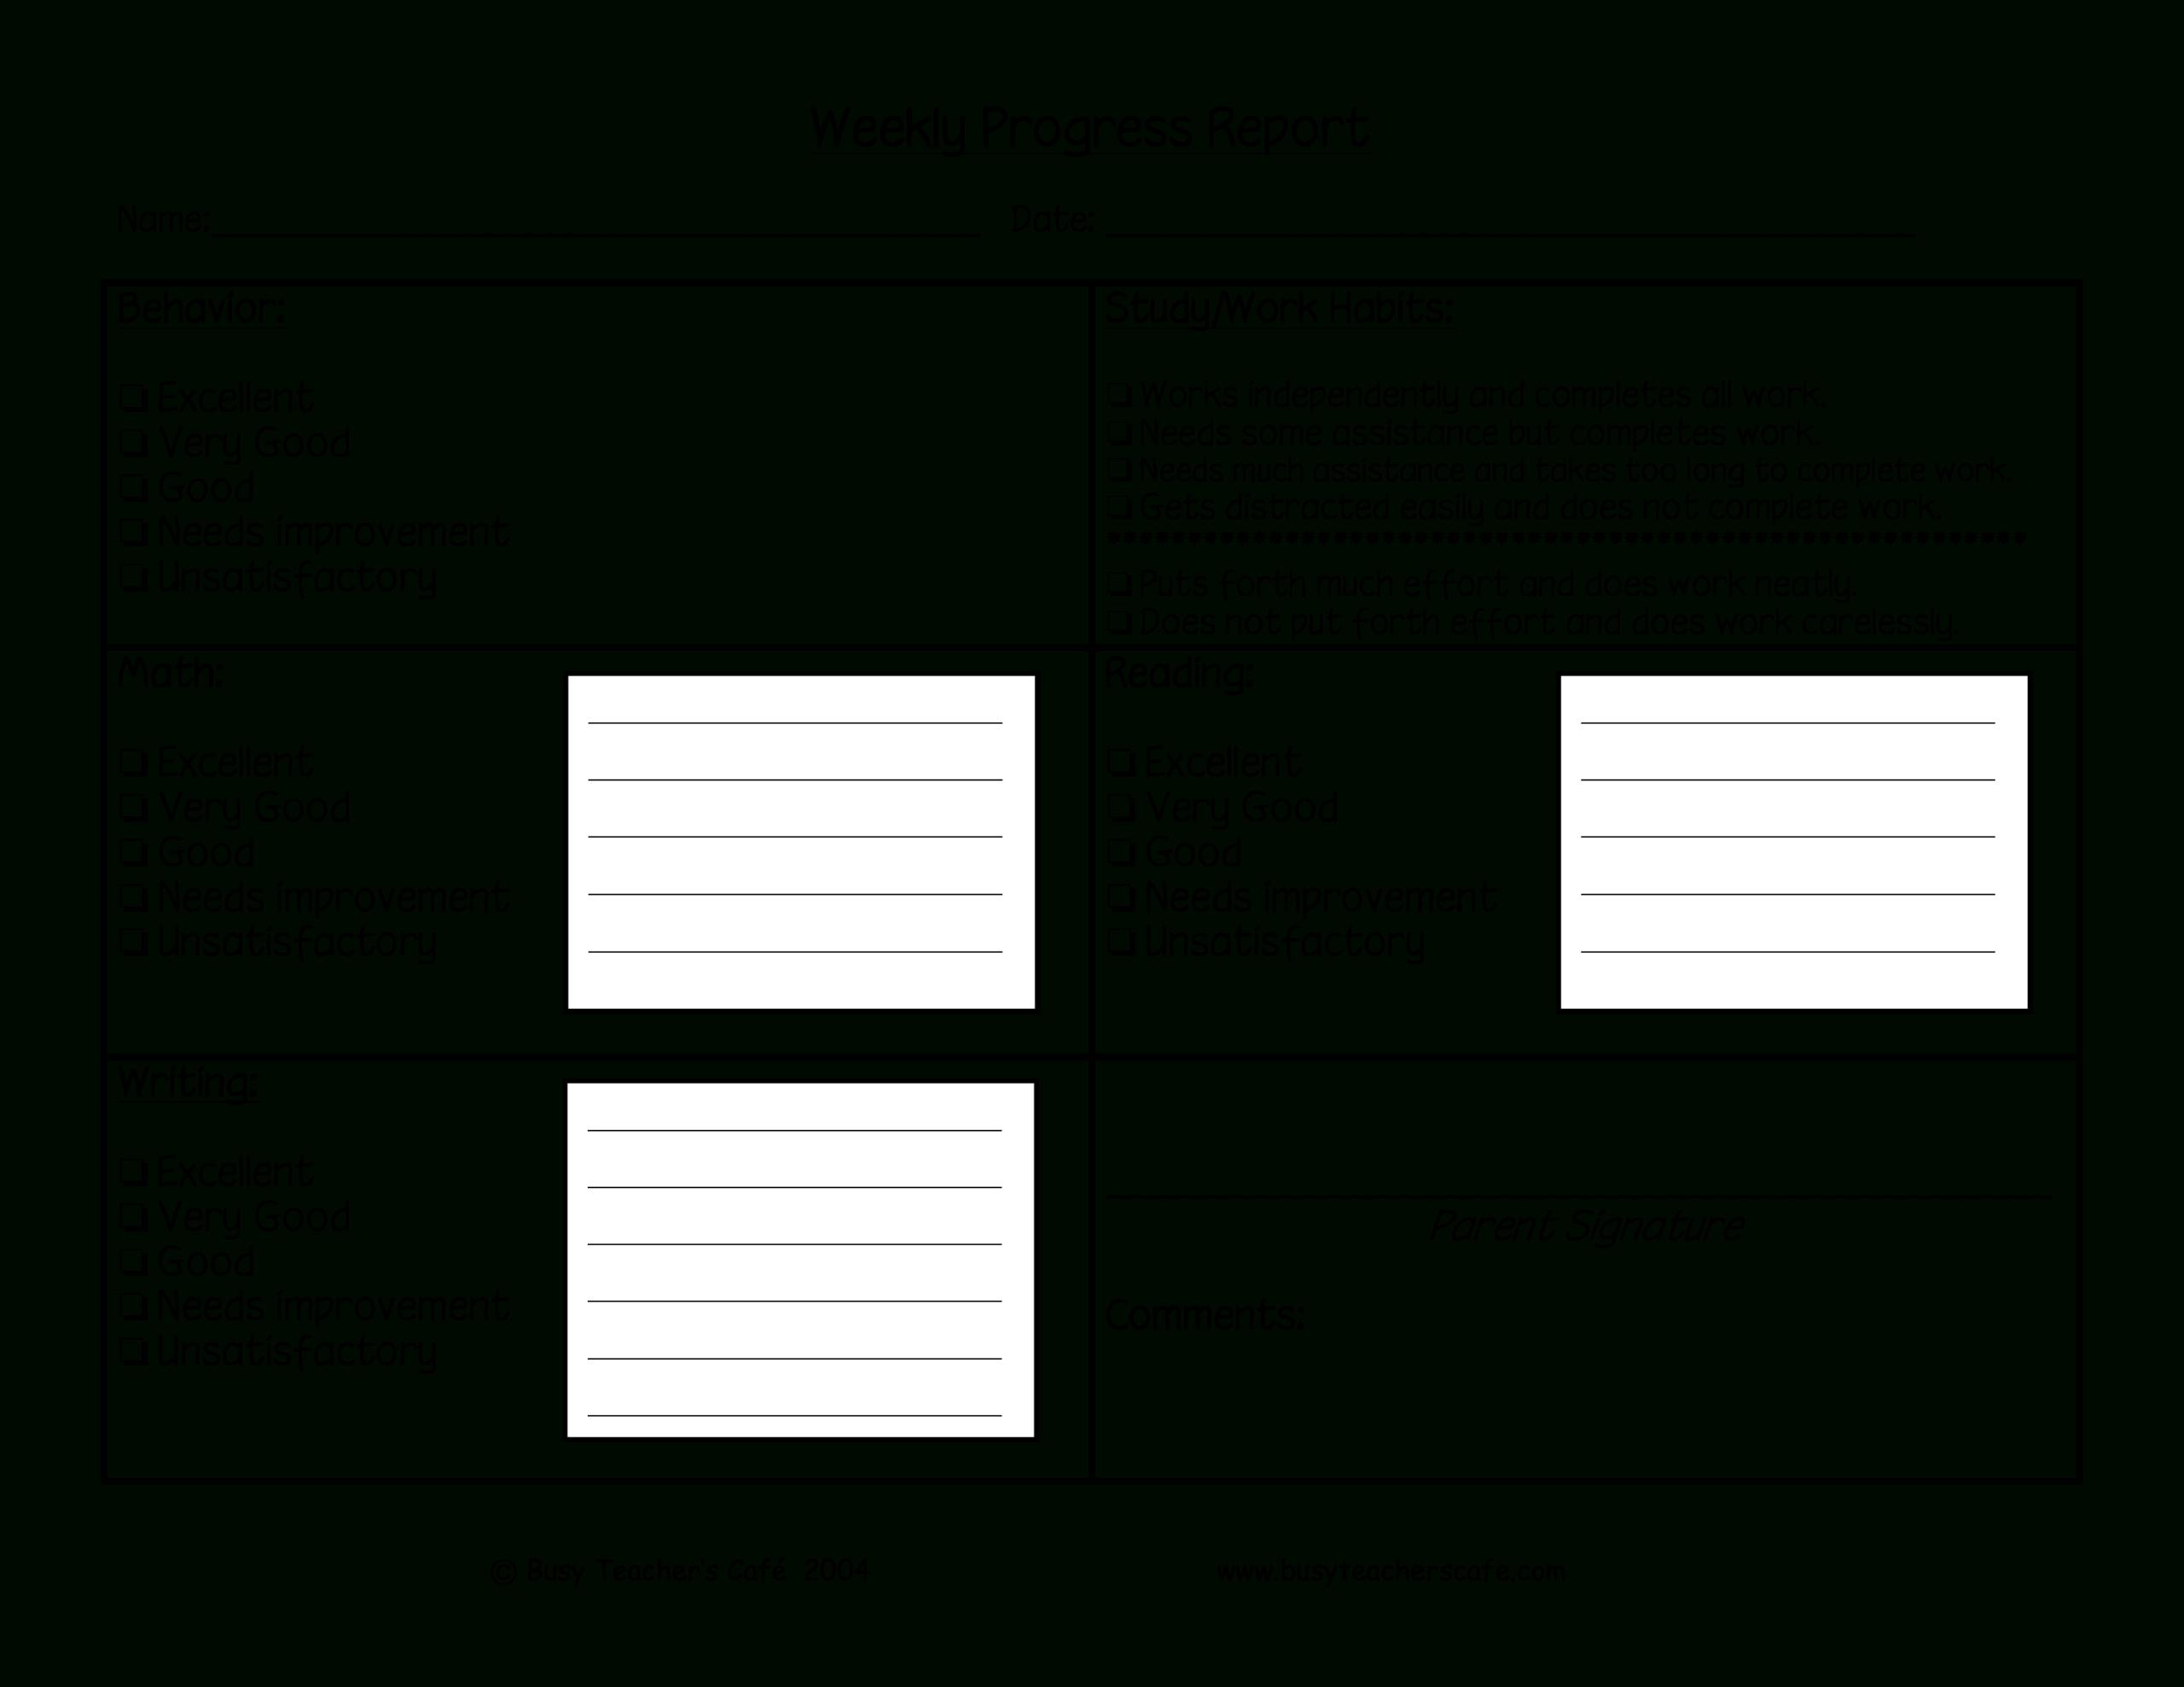 Weekly Student Behavior Report | Templates At Regarding Behaviour Report Template